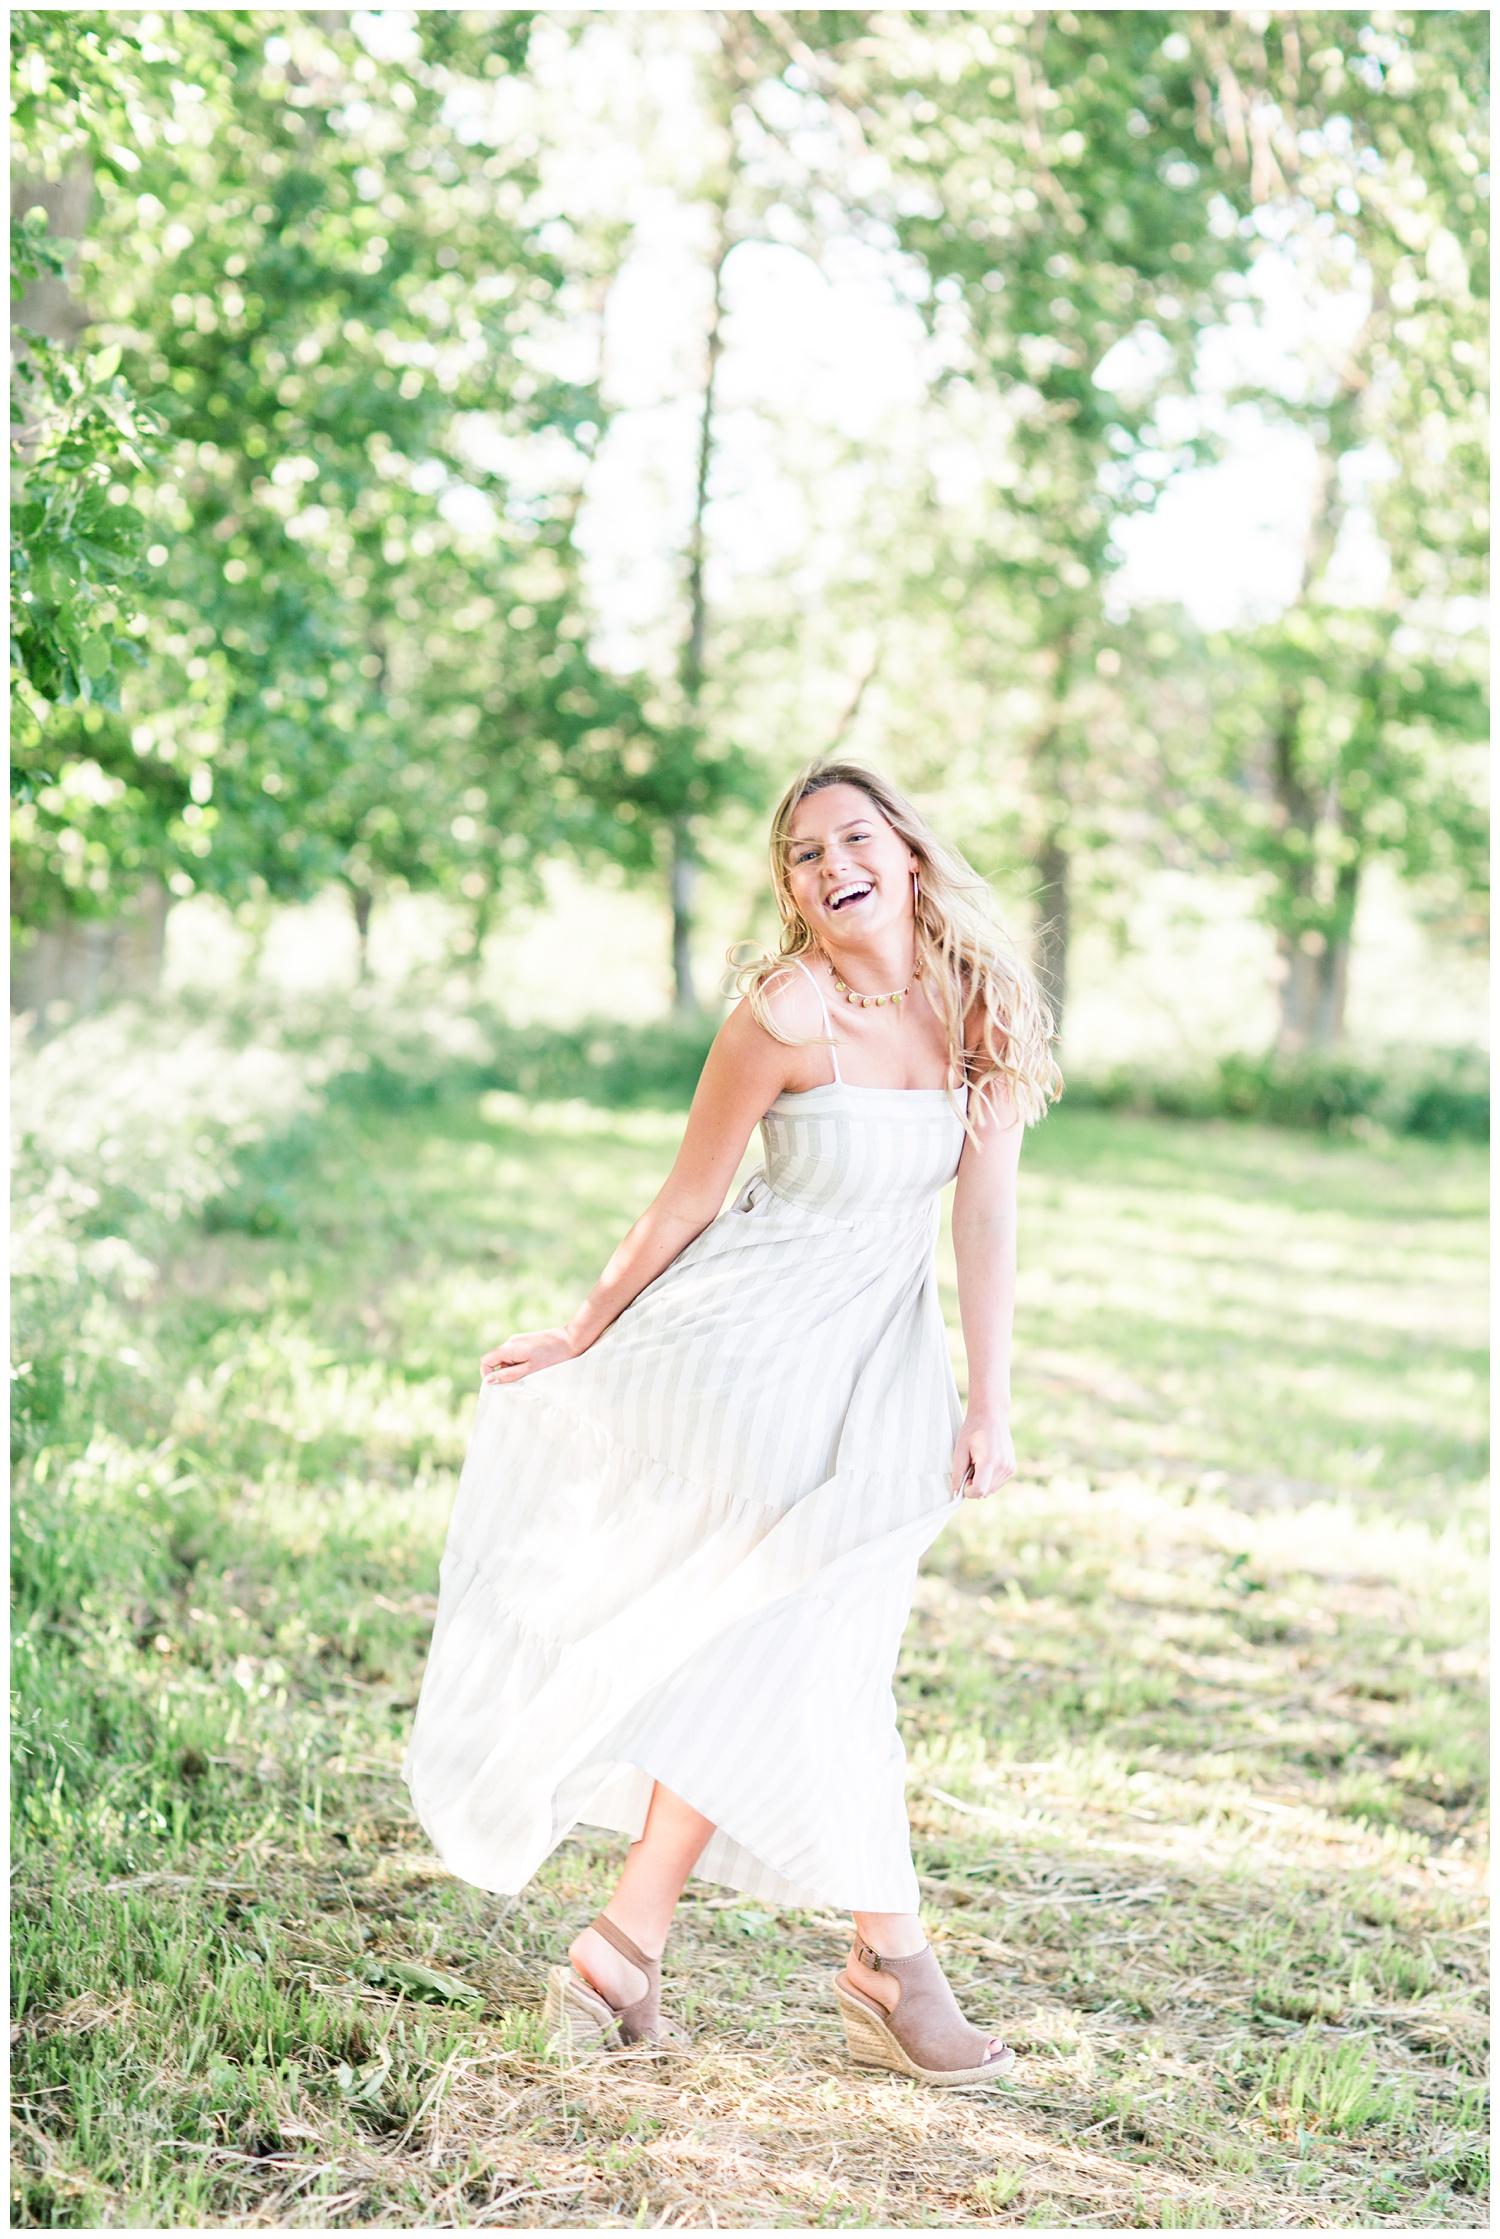 Senior girl dances in a grassy field wearing a flowing white summer dress | CB Studio